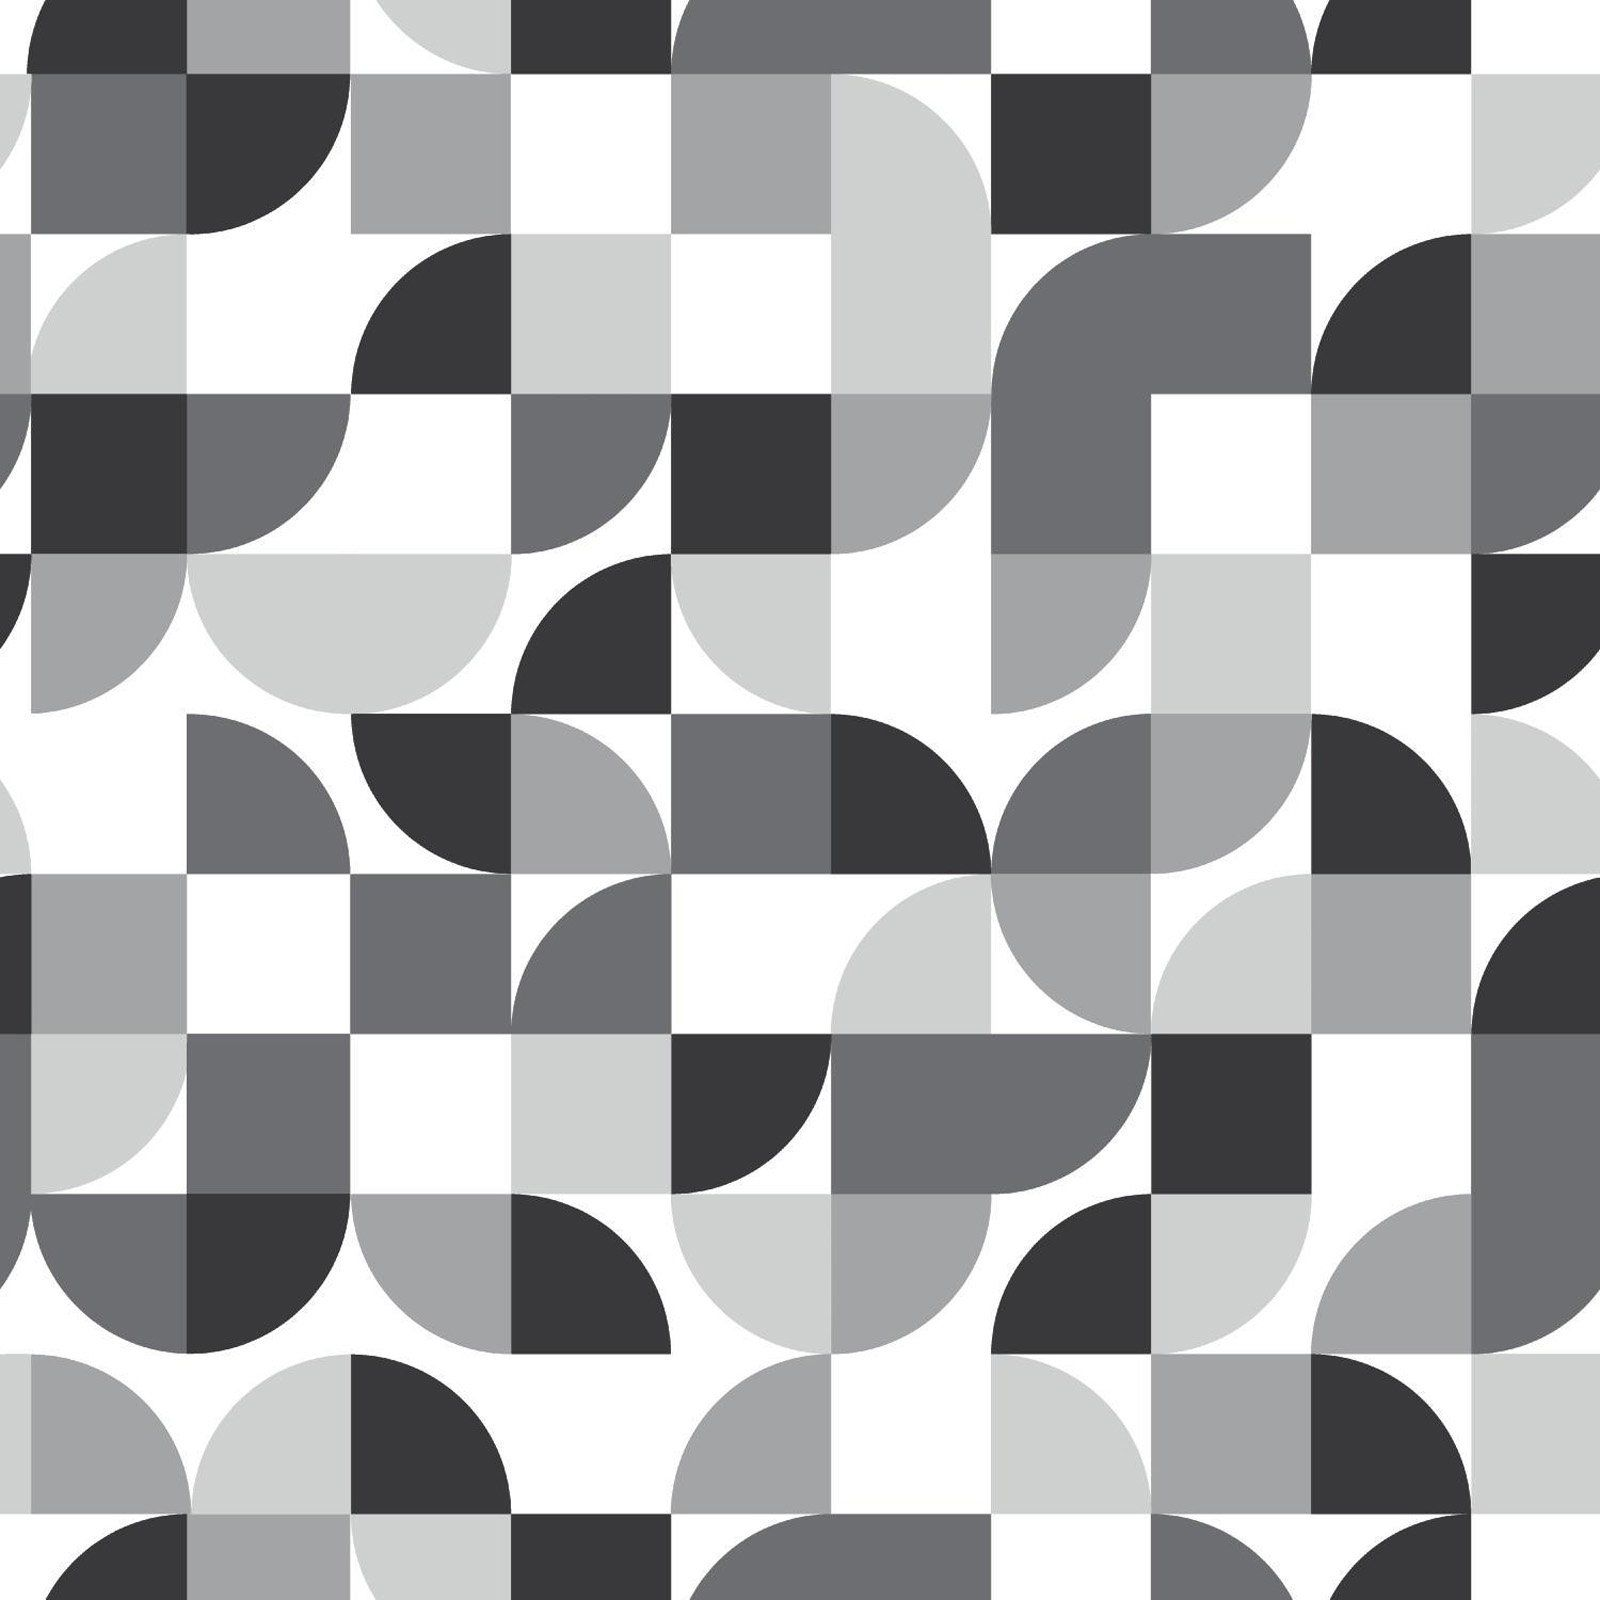 RoomMates MidCentury Geometric Peel and Stick Wallpaper